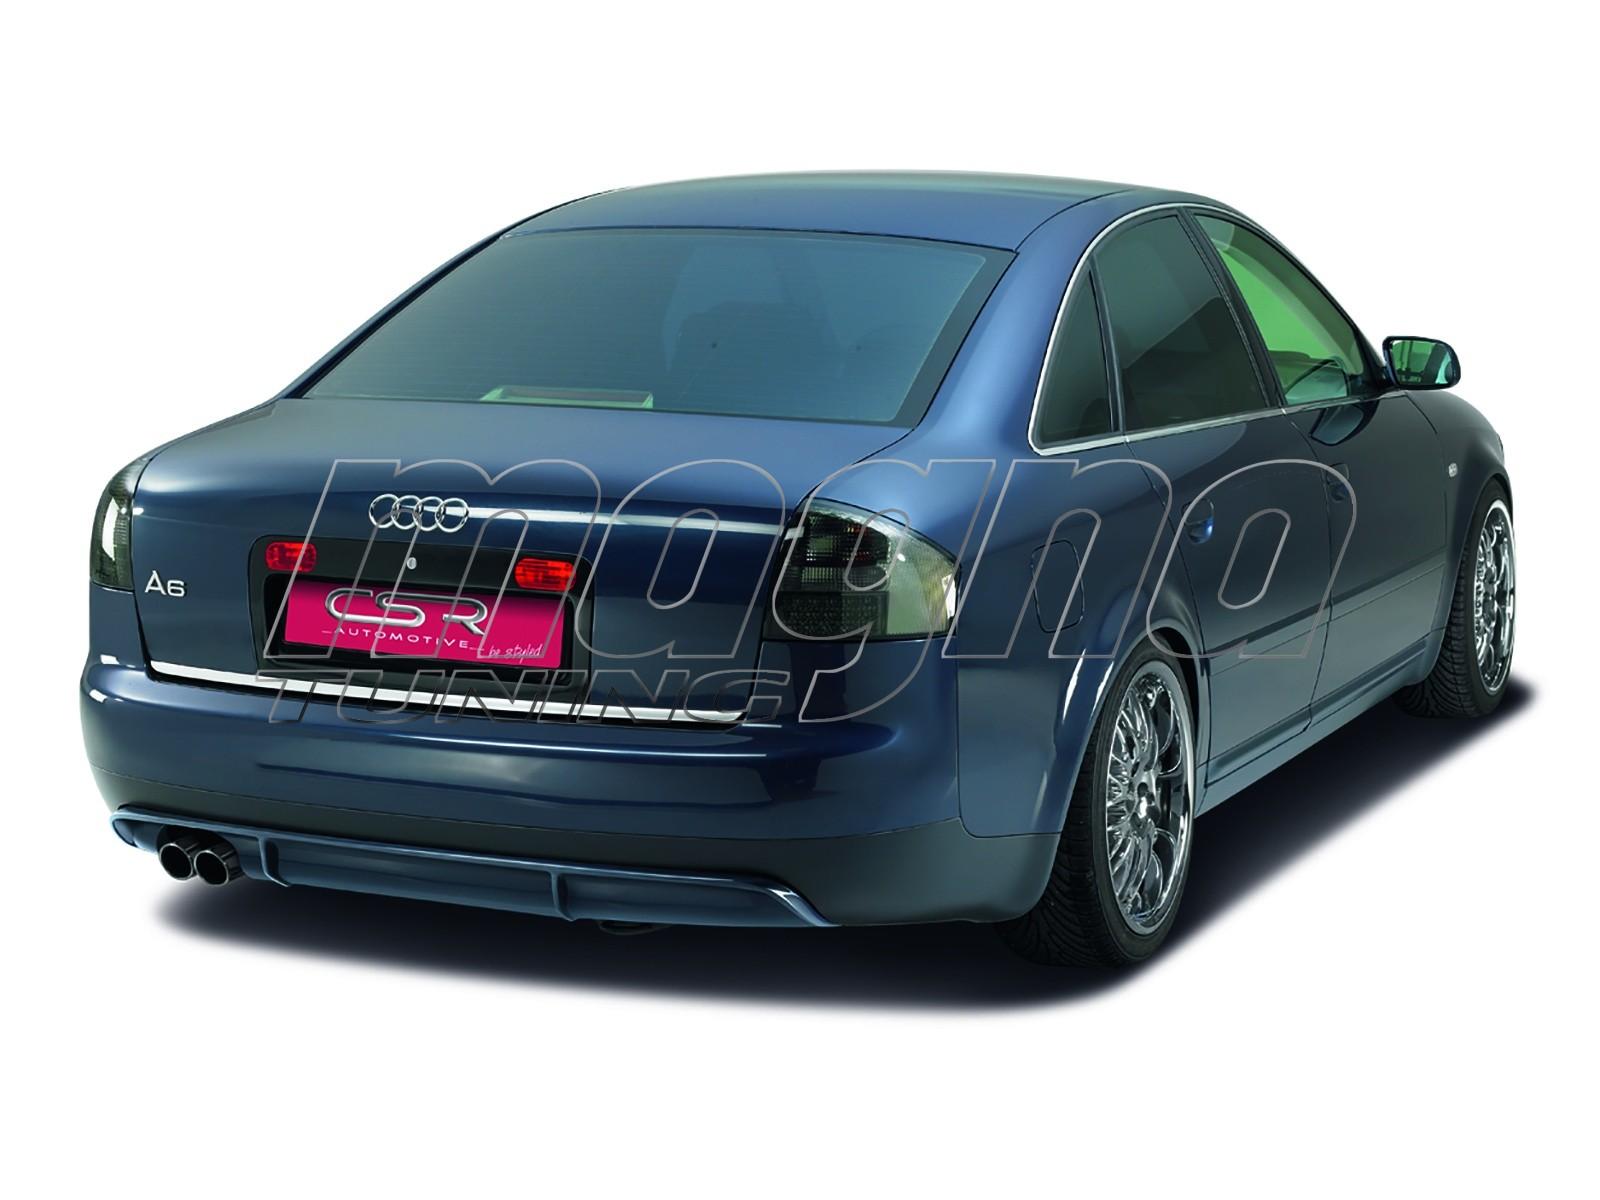 audi a6 4b newline rear bumper extension. Black Bedroom Furniture Sets. Home Design Ideas